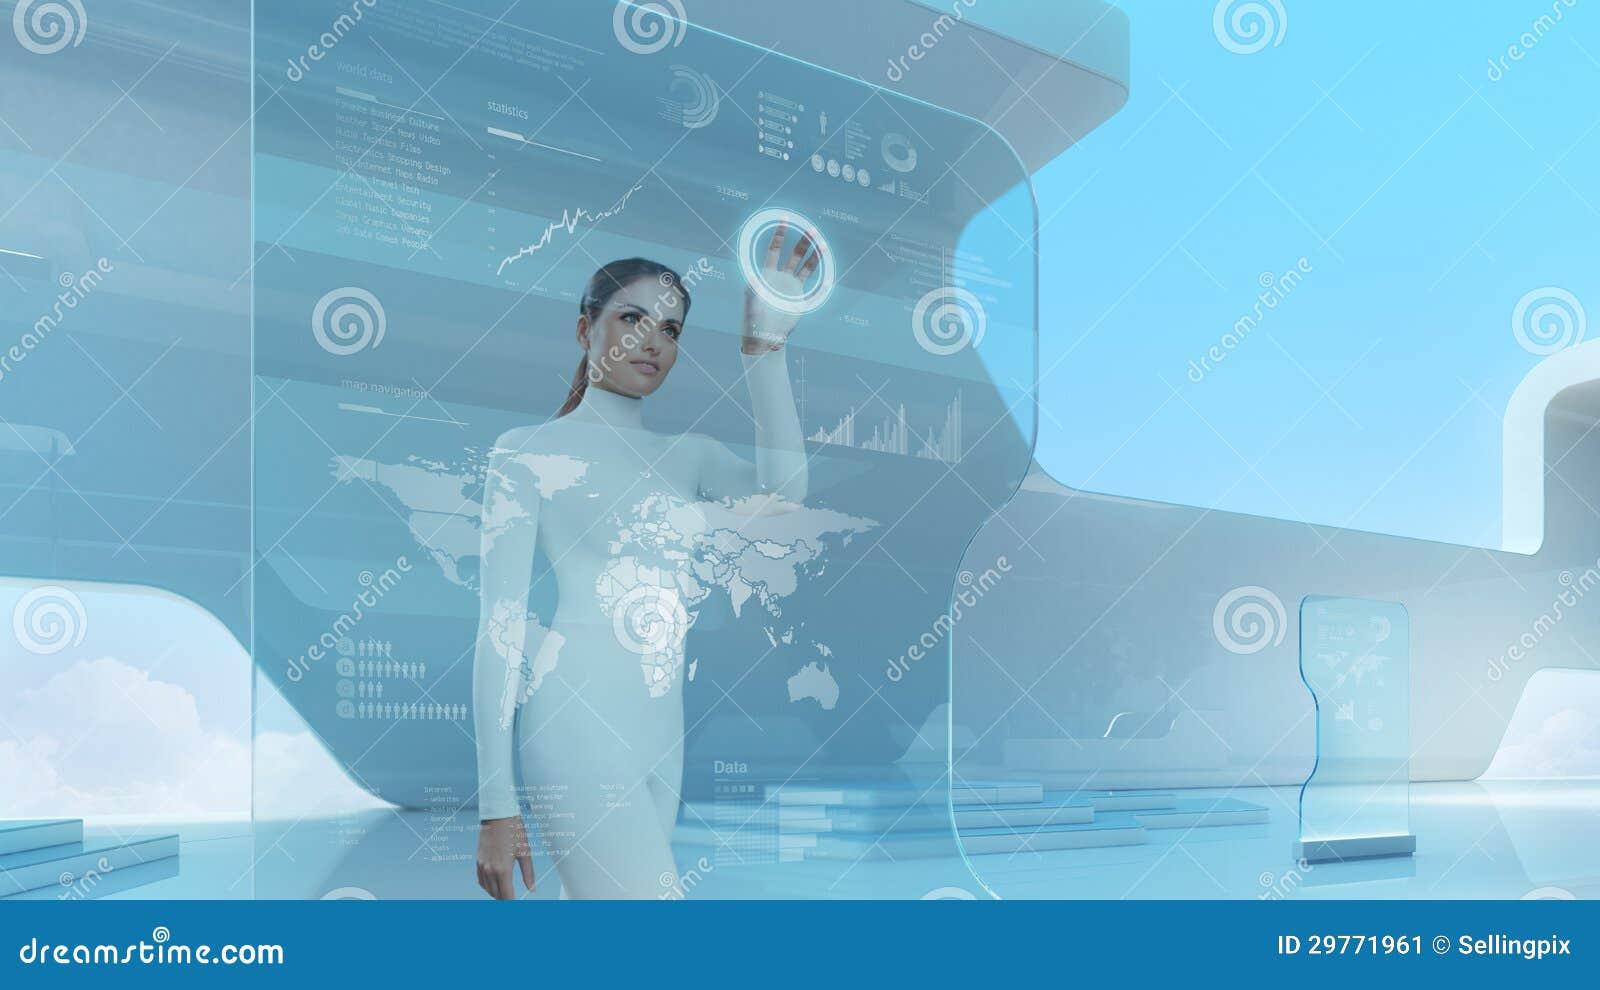 future technology touchscreen interface stock image